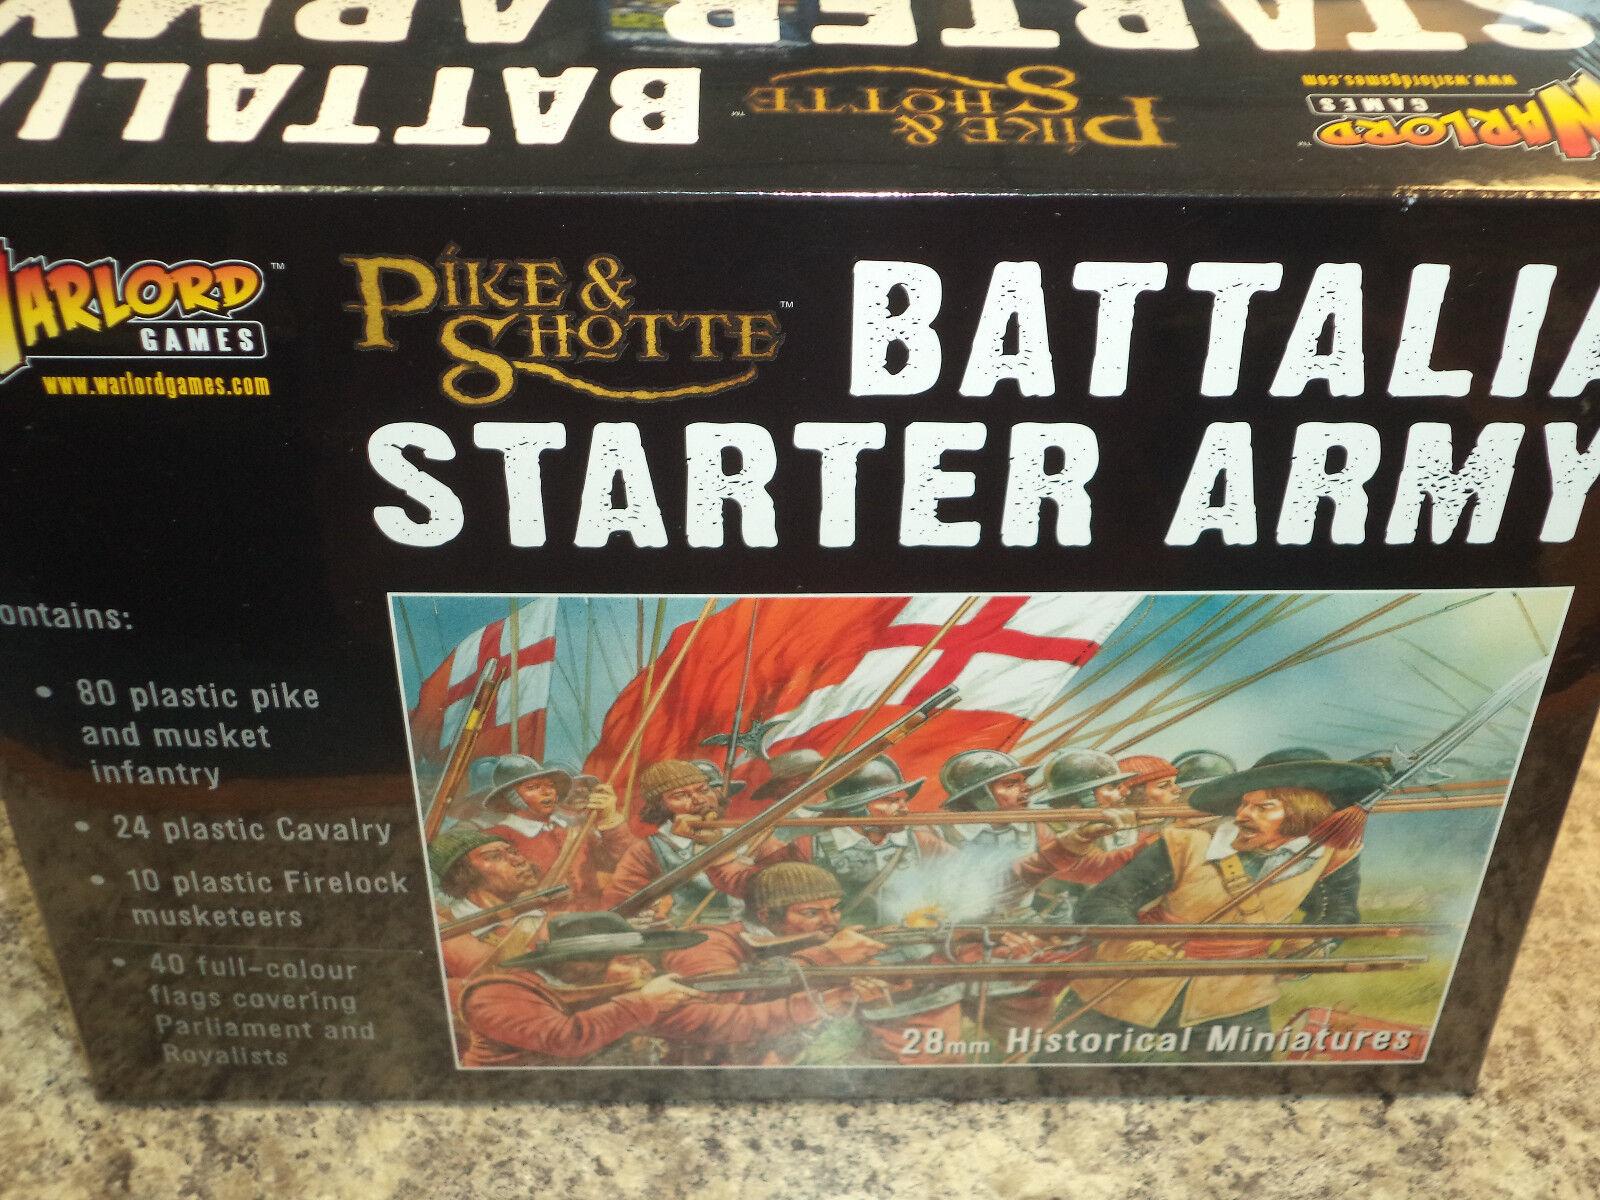 Battalia Stkonster Army Pike och Svarmte Set Warlord spel New &